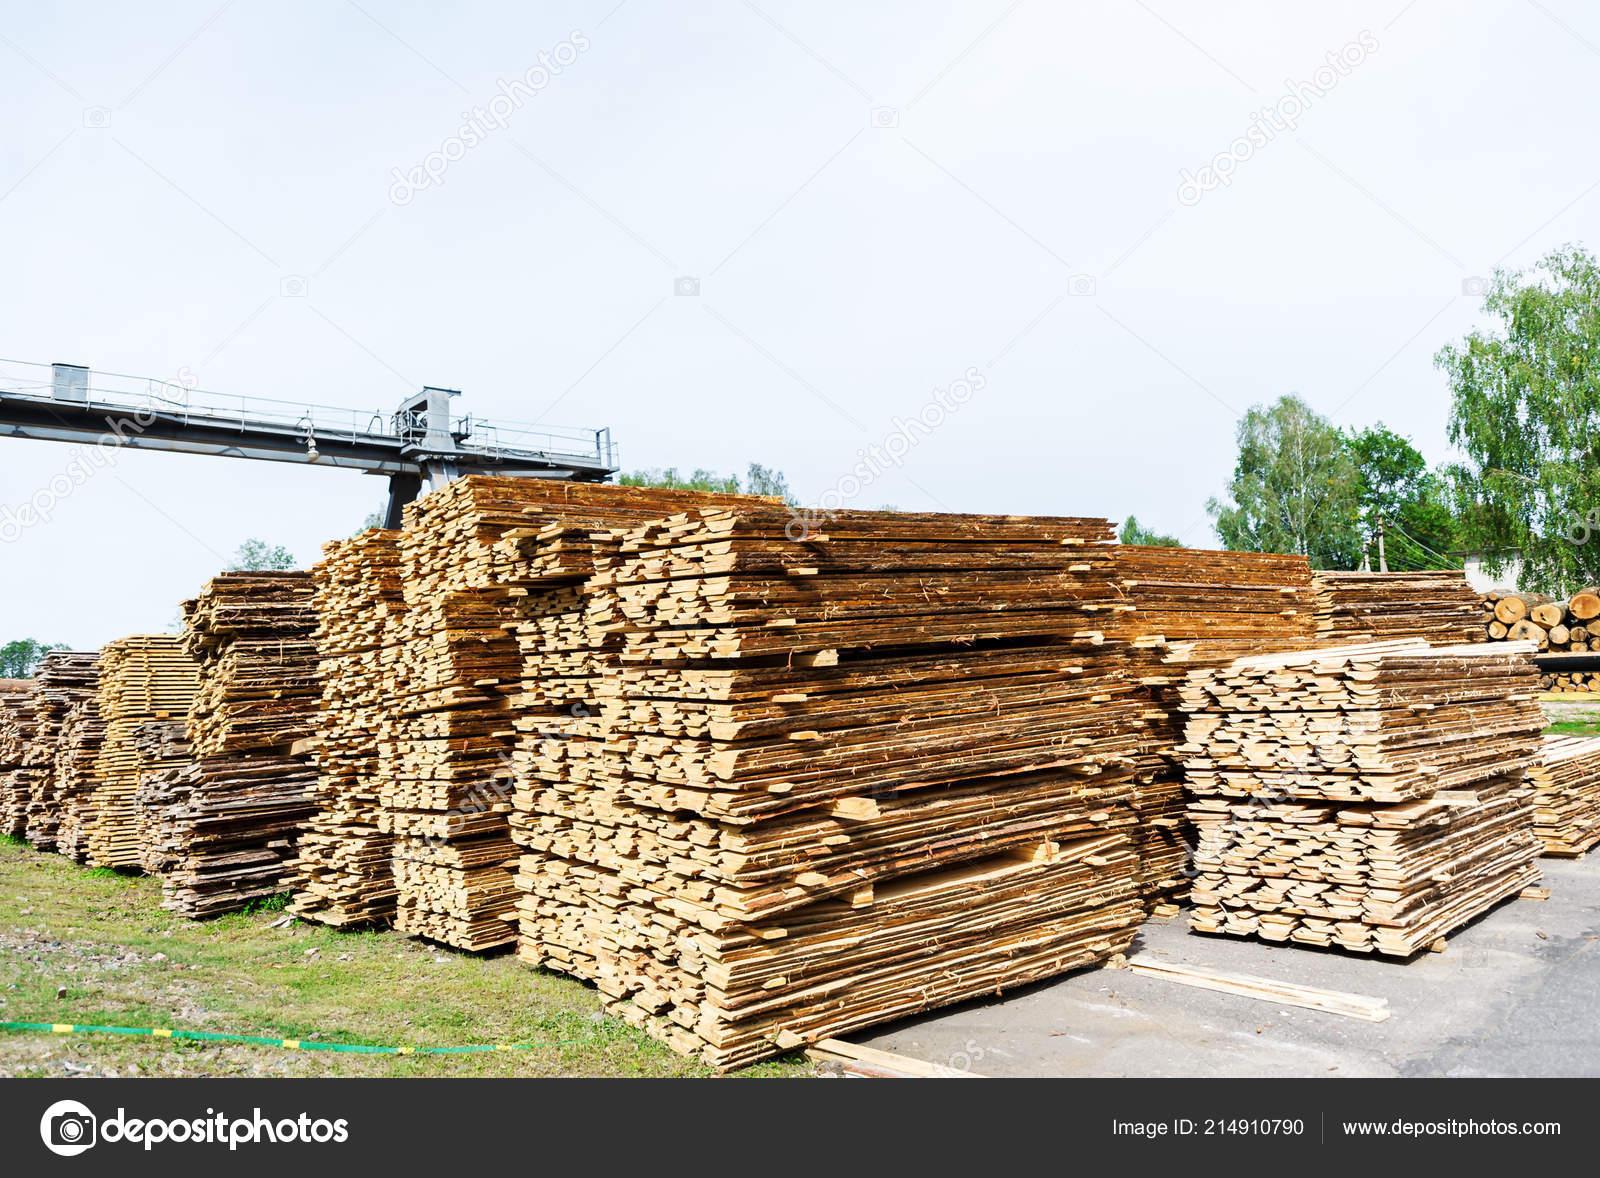 Sawmill Warehouse Sawing Boards Sawmill Outdoors Wood Timber